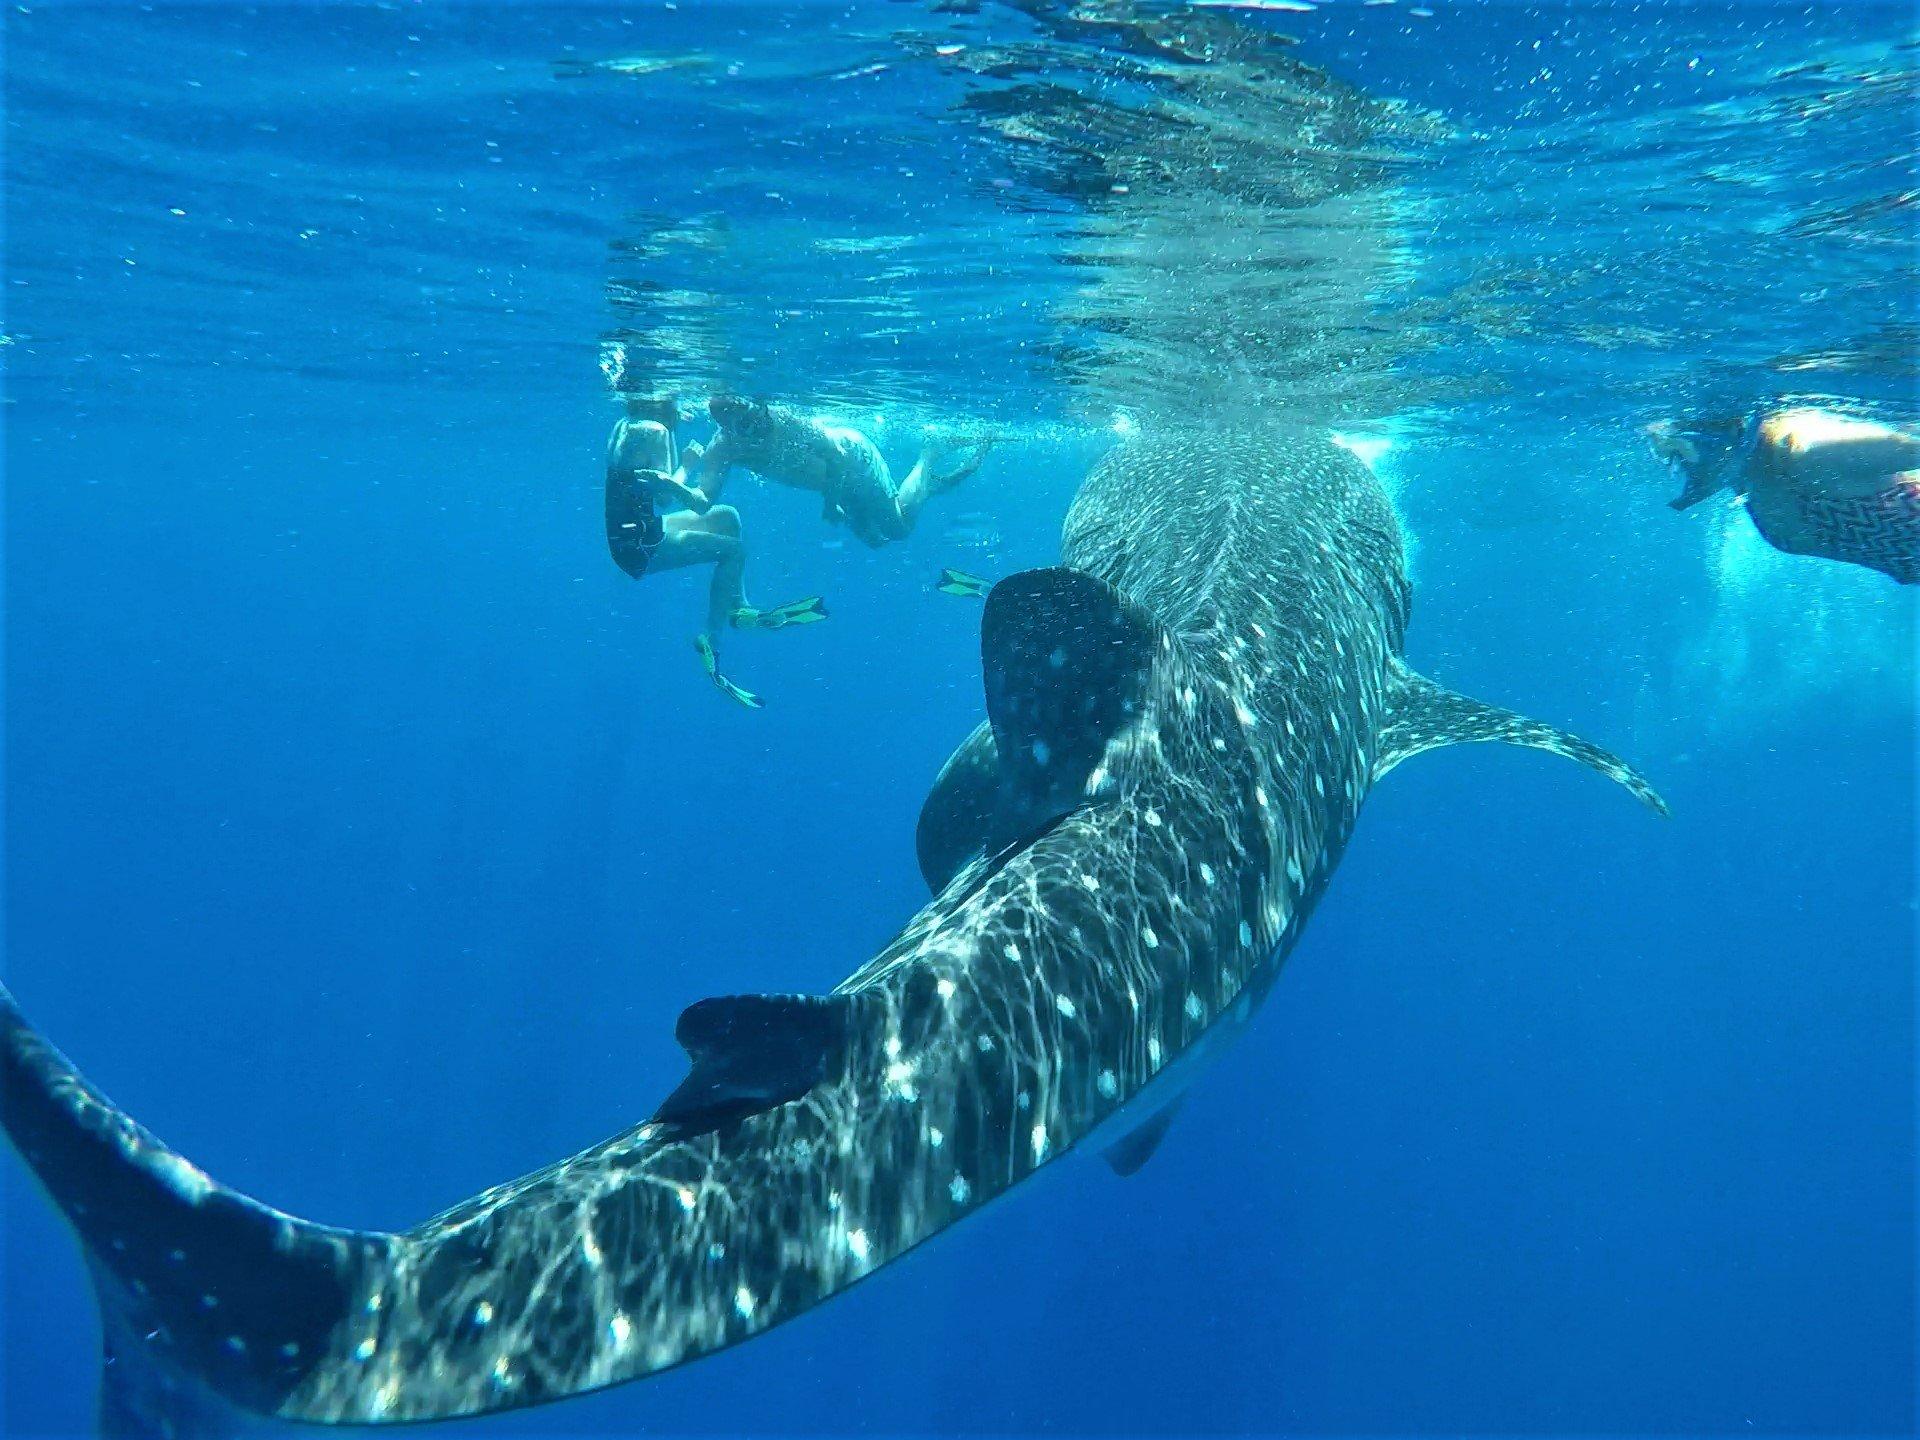 Into The Blue - Kona Snorkel Adventures